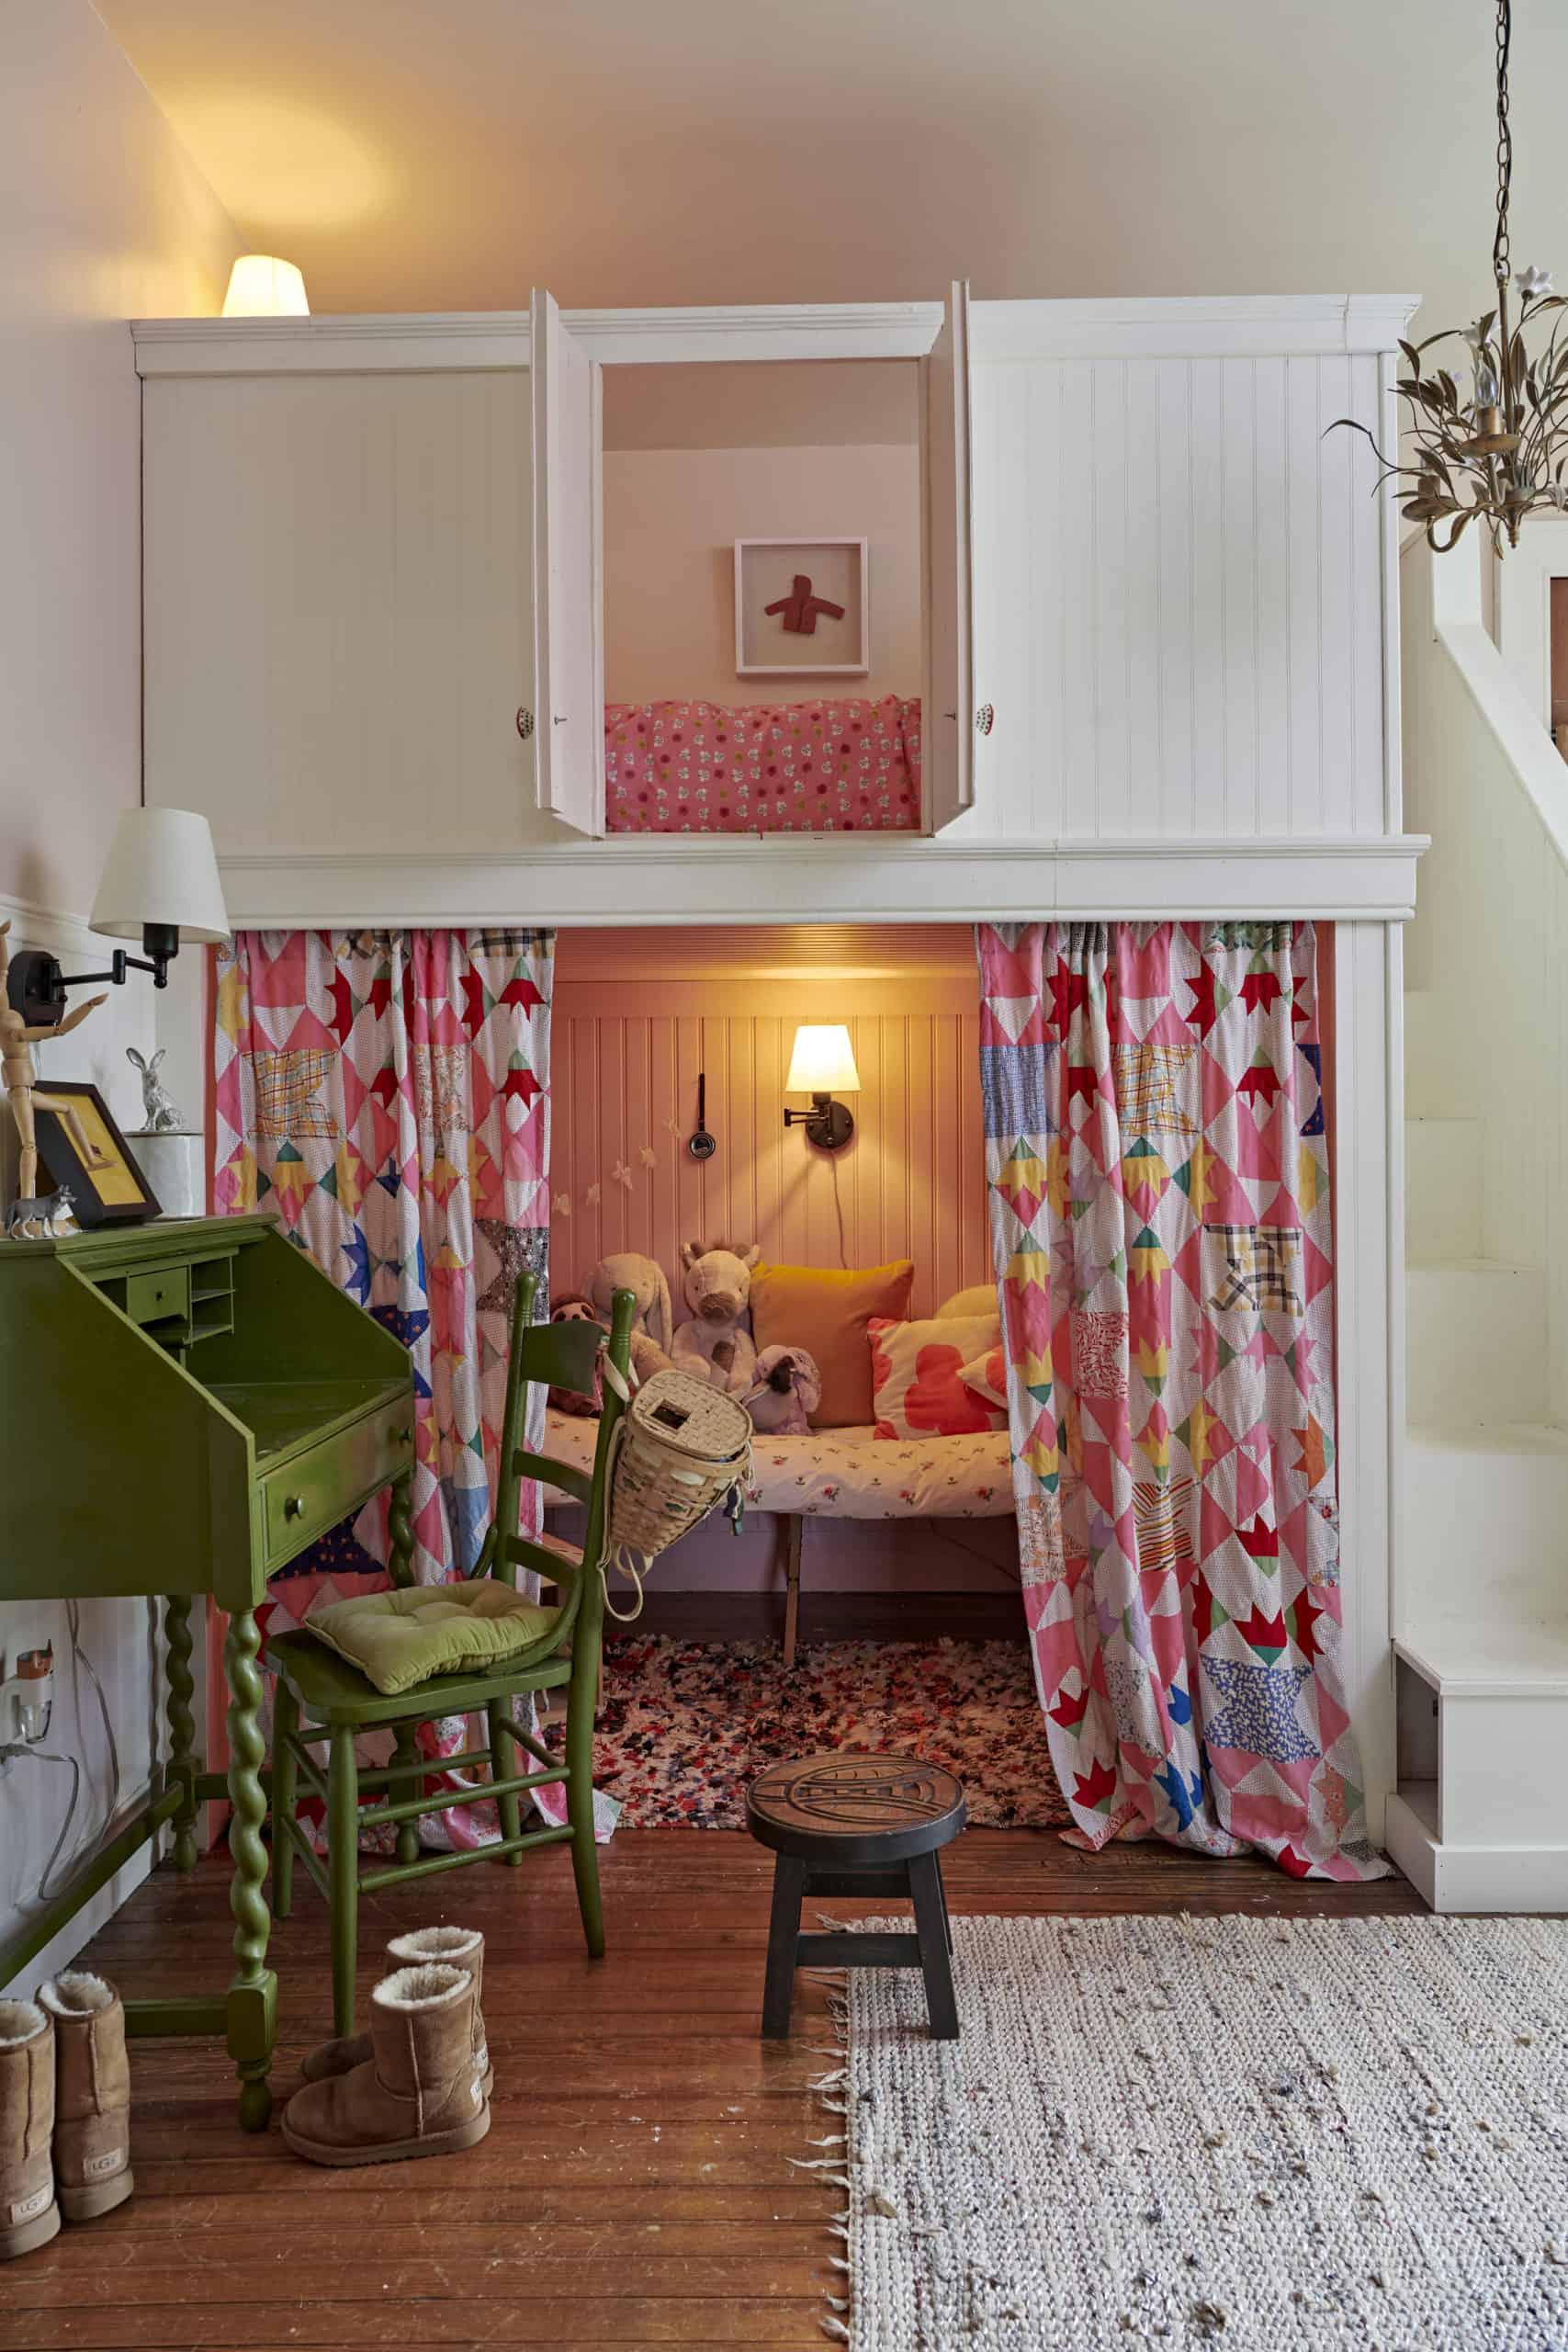 heather ross Catskills house tour